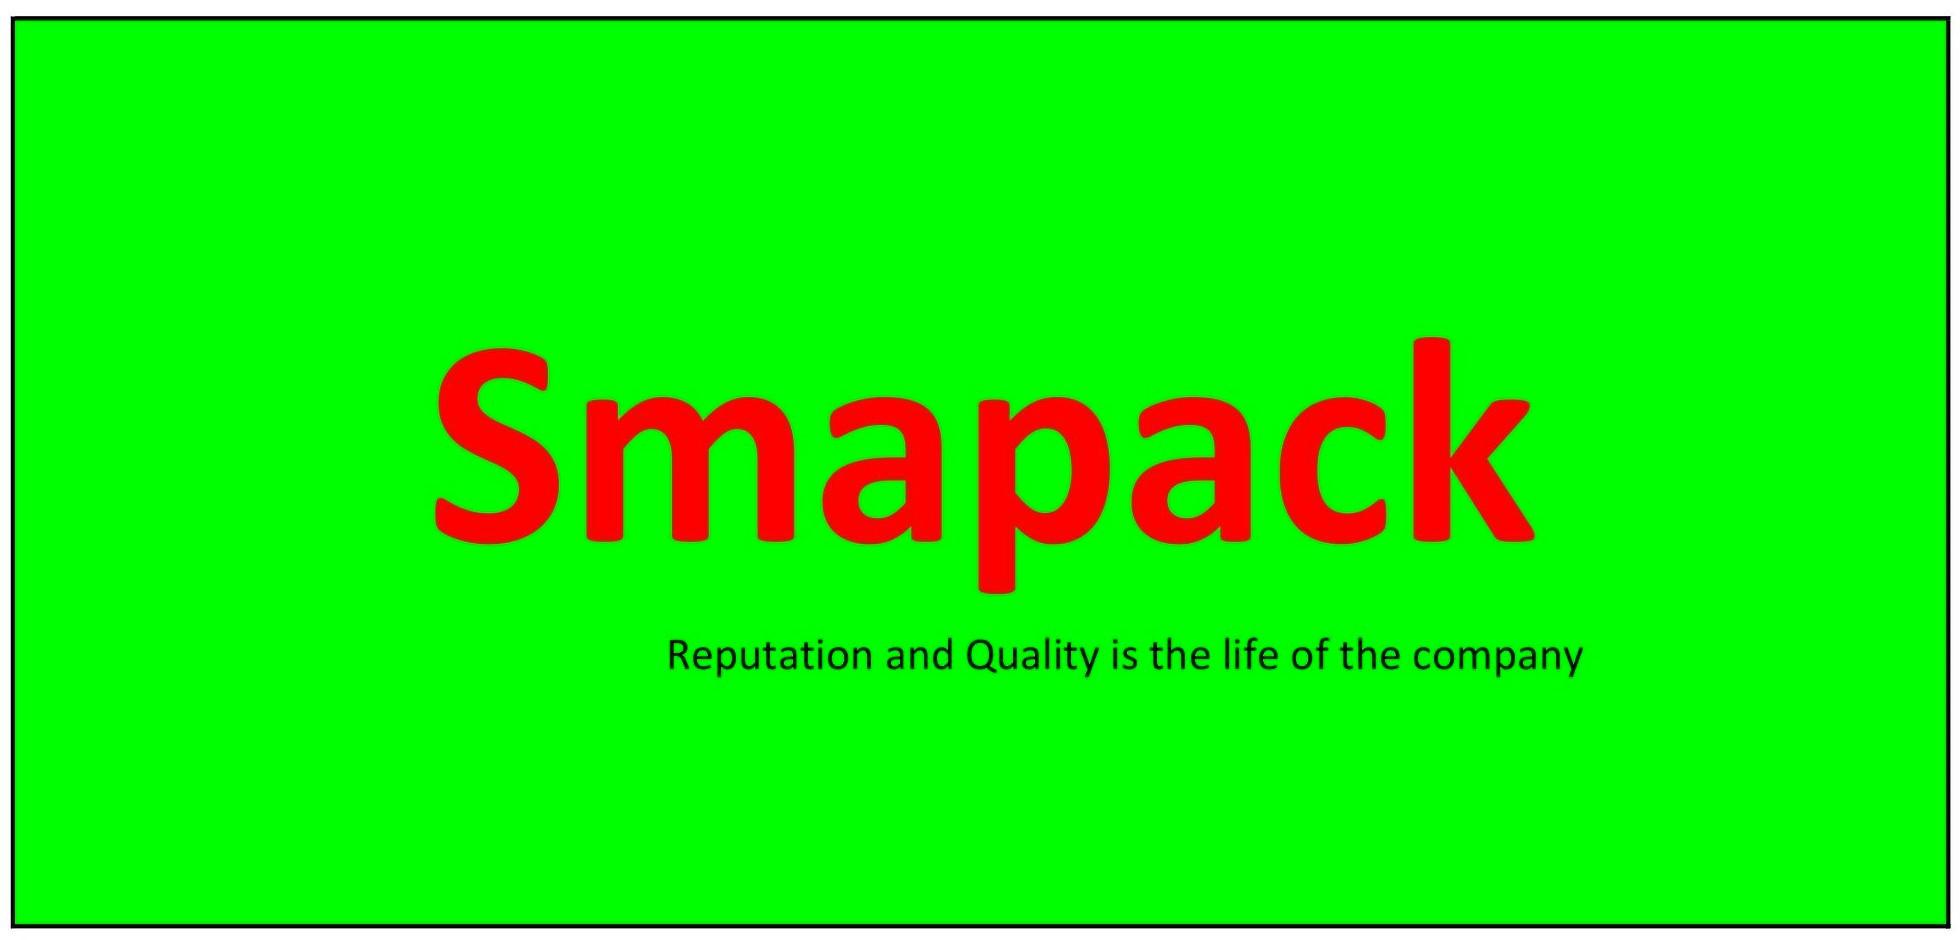 Smapack